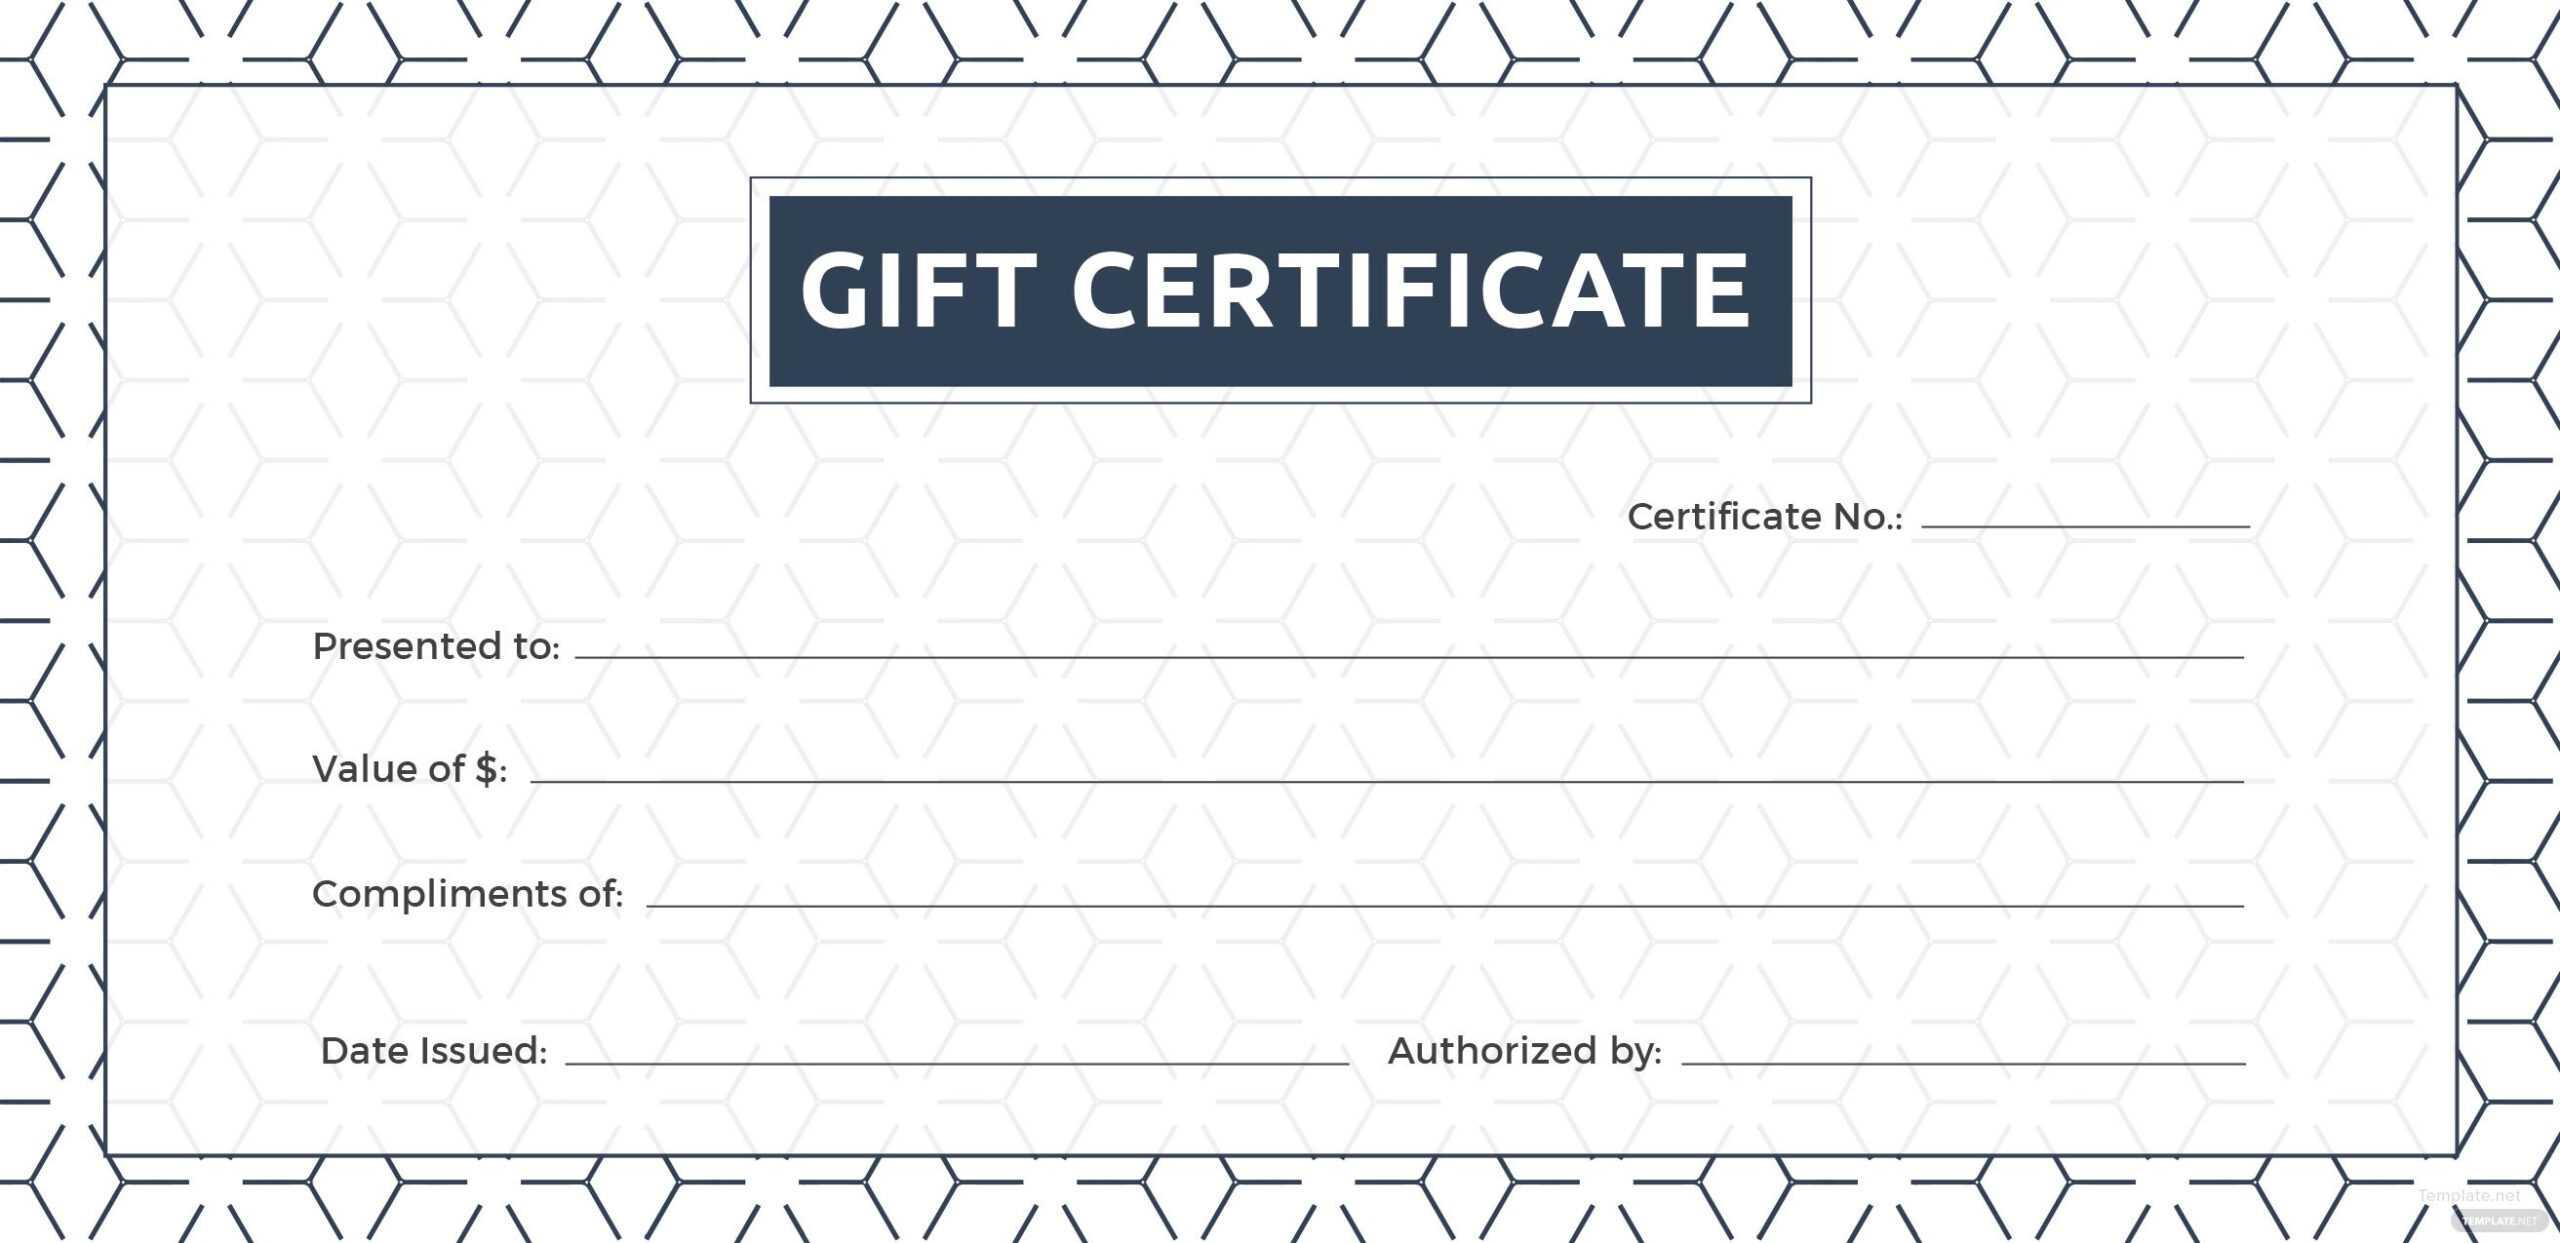 Certificates. Interesting Certificate Template For Pages Regarding Certificate Template For Pages